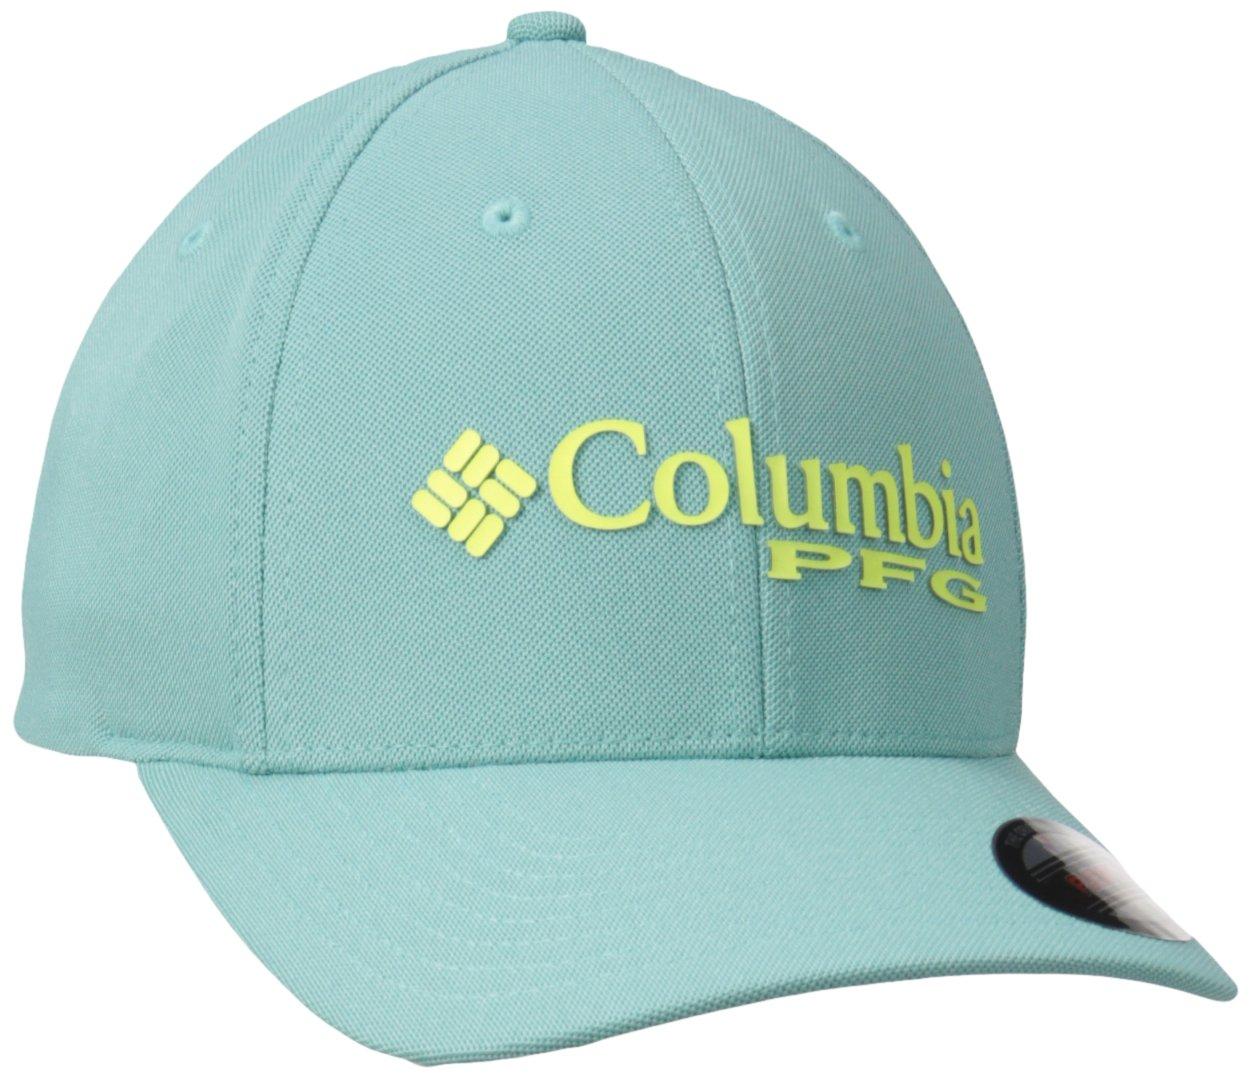 3b1d093e11a6a Columbia PFG Mesh Pique Ball Cap - CU9020-486   Hats   Caps   Sports ...